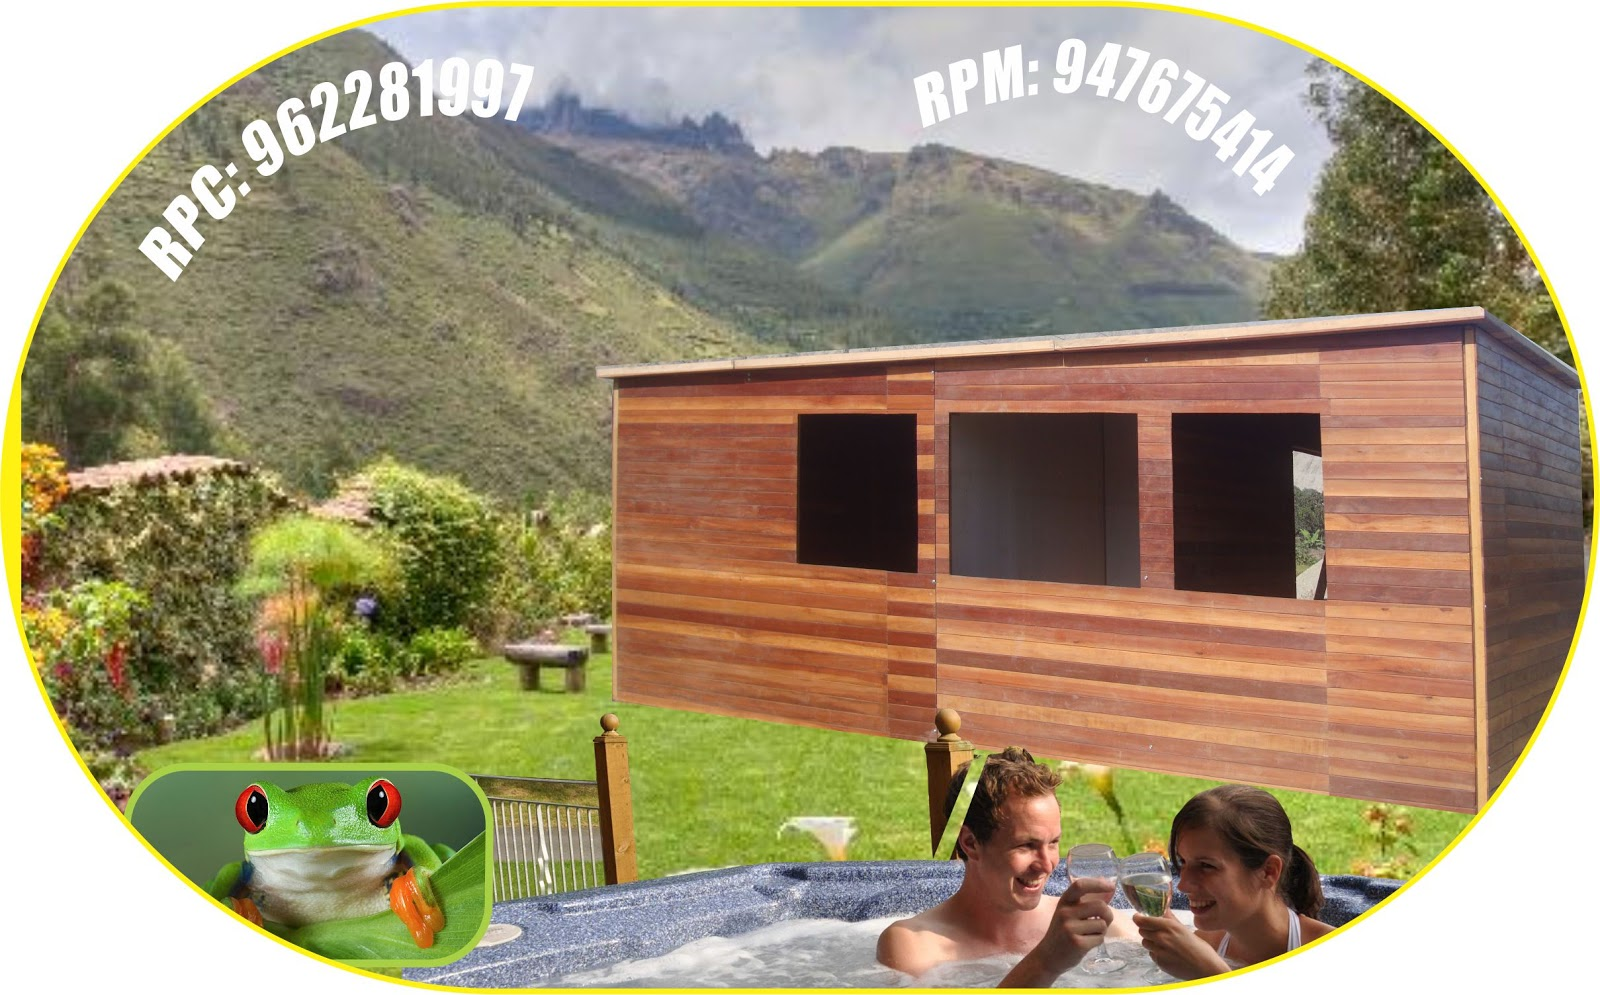 Casas prefabricadas econ micas de madera - Casa prefabricadas economicas ...